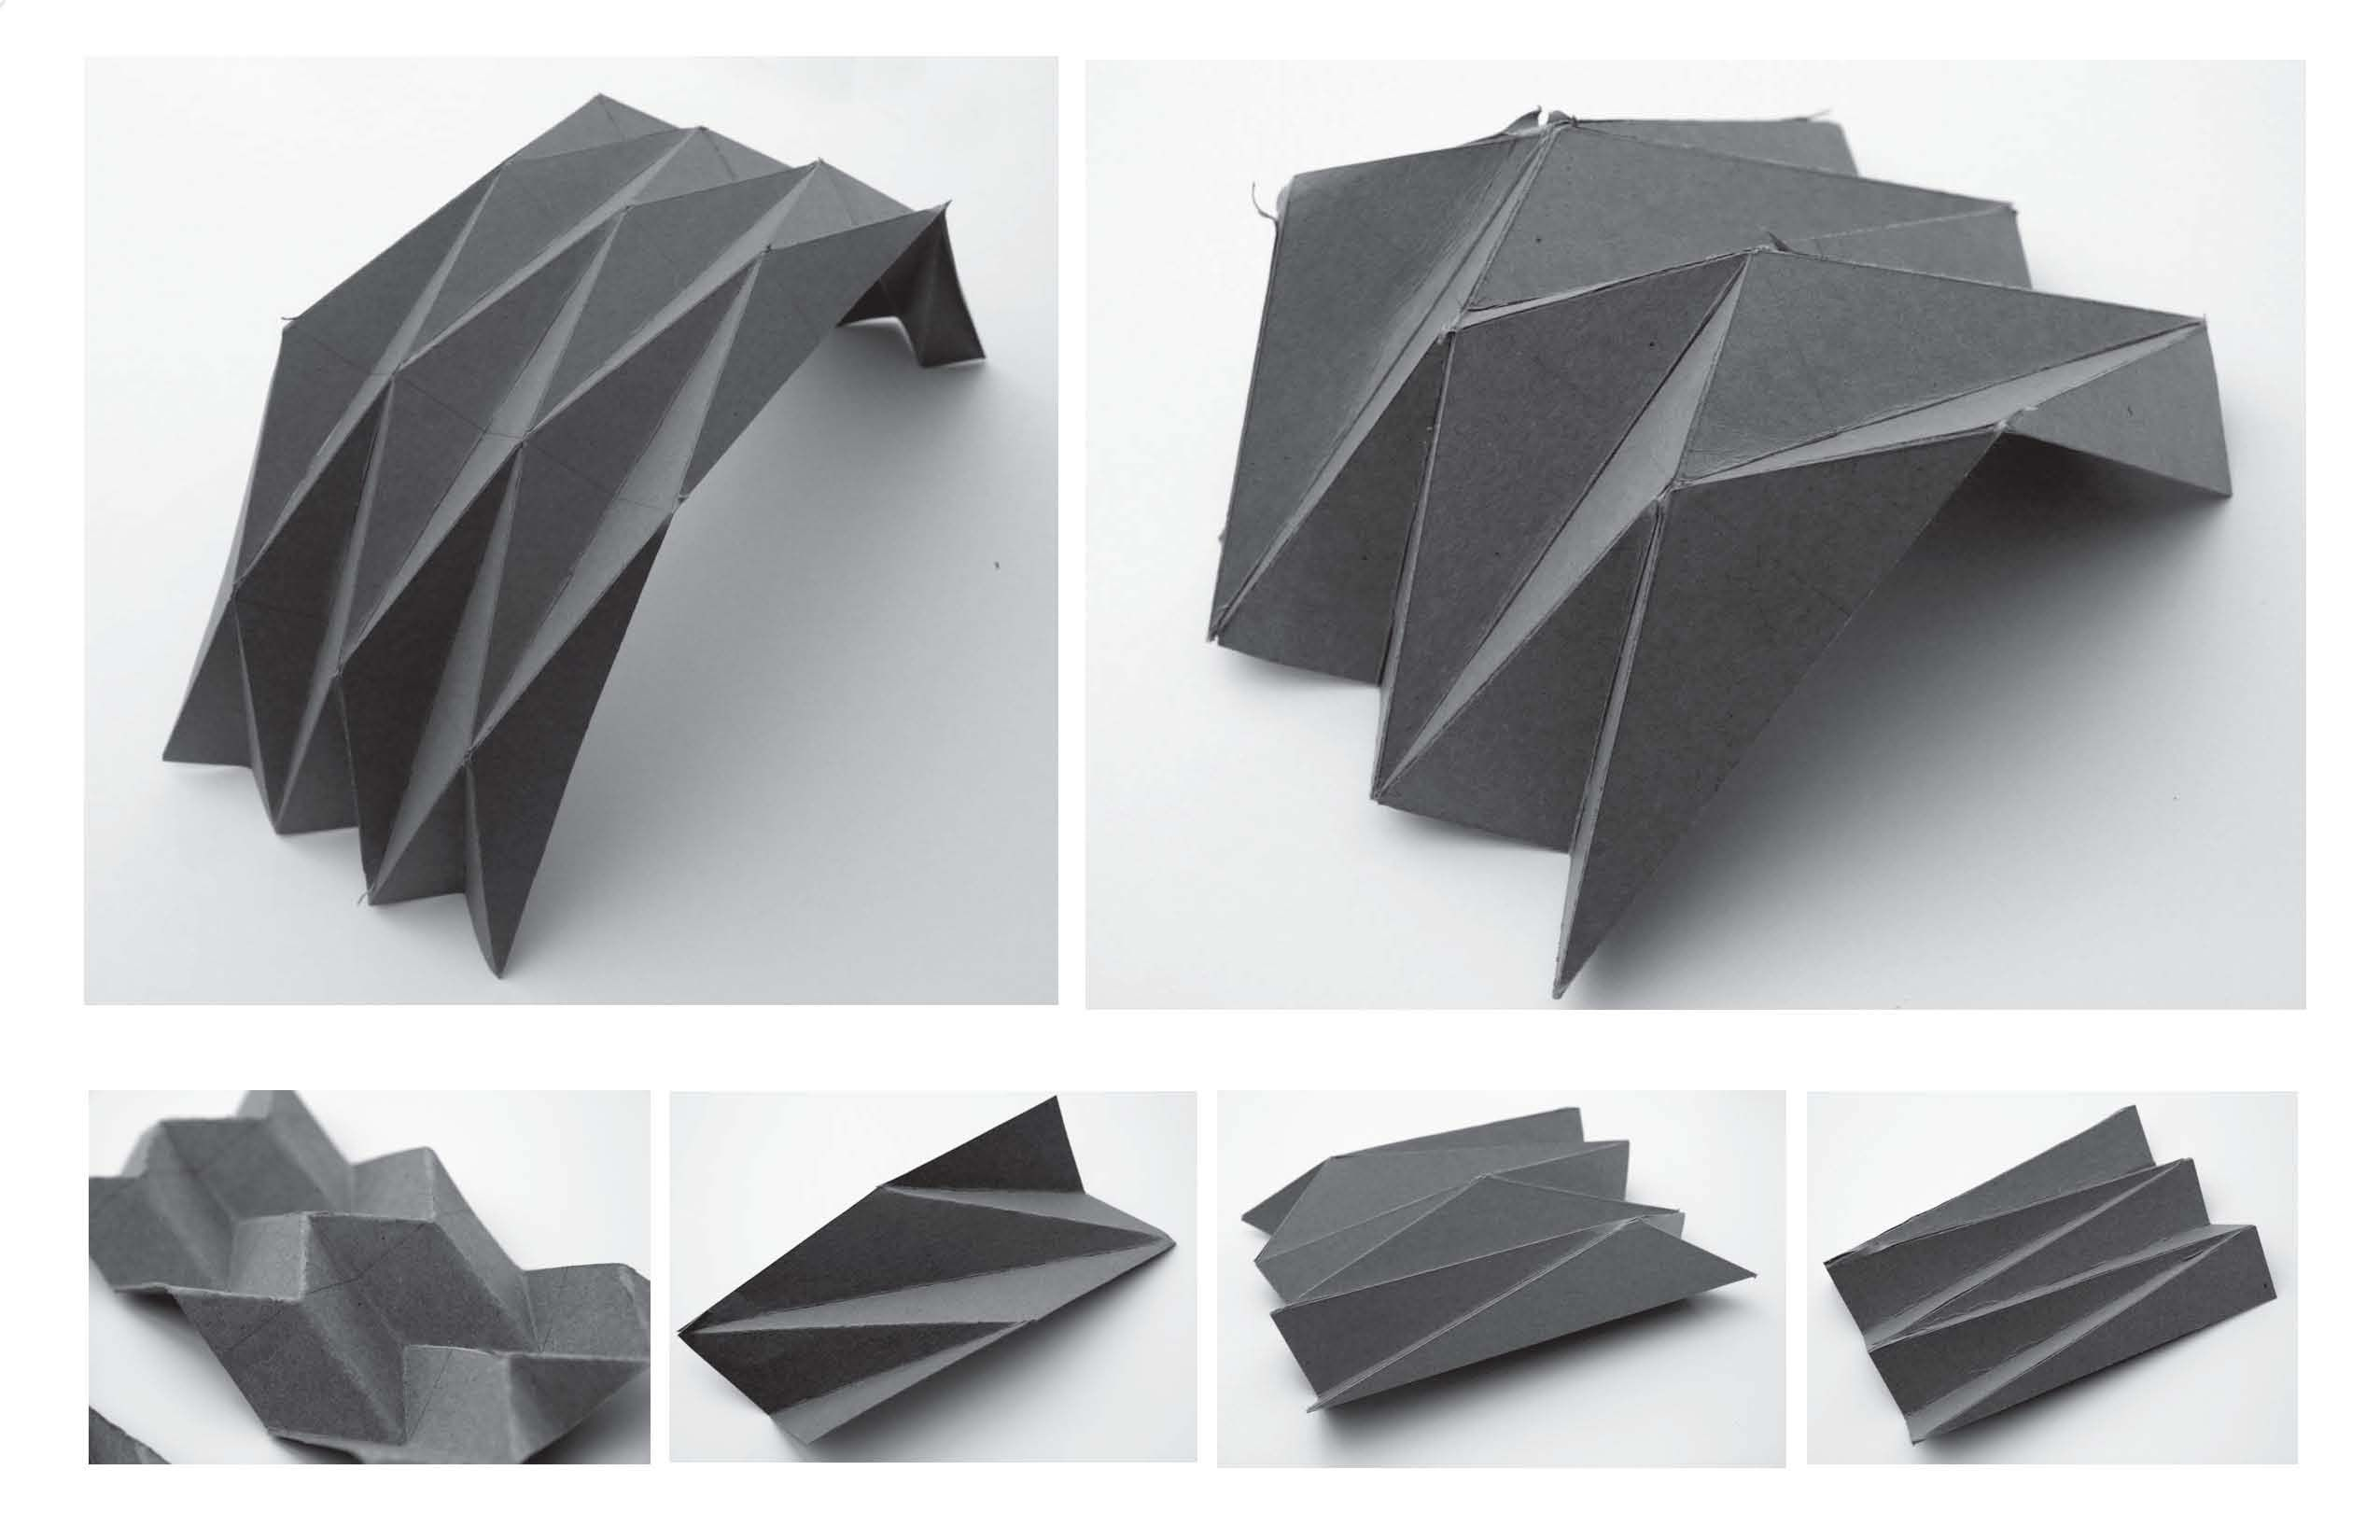 Fold Plate Design Origami Architecture Folding